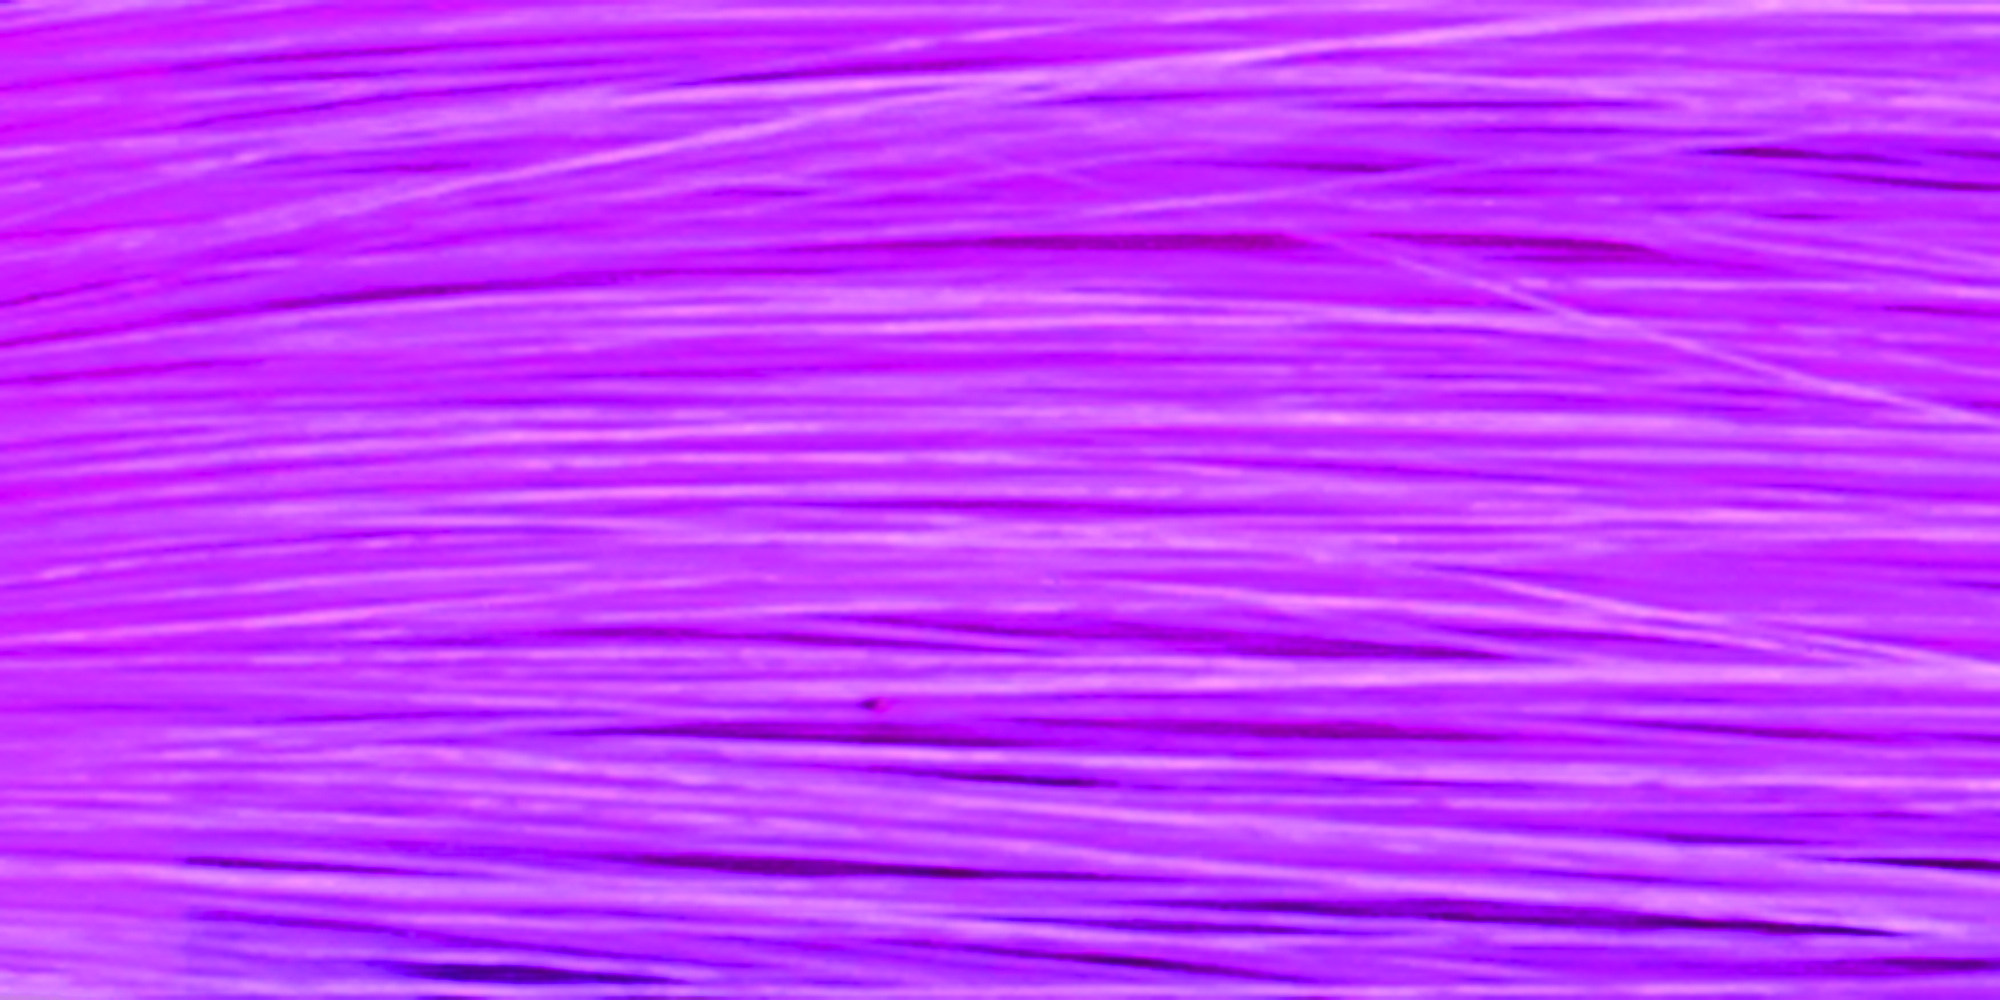 Stargazer-Baby-Hair-Extension-Synthetic-Clip-on-Streak-Various-Colors-43cm thumbnail 18